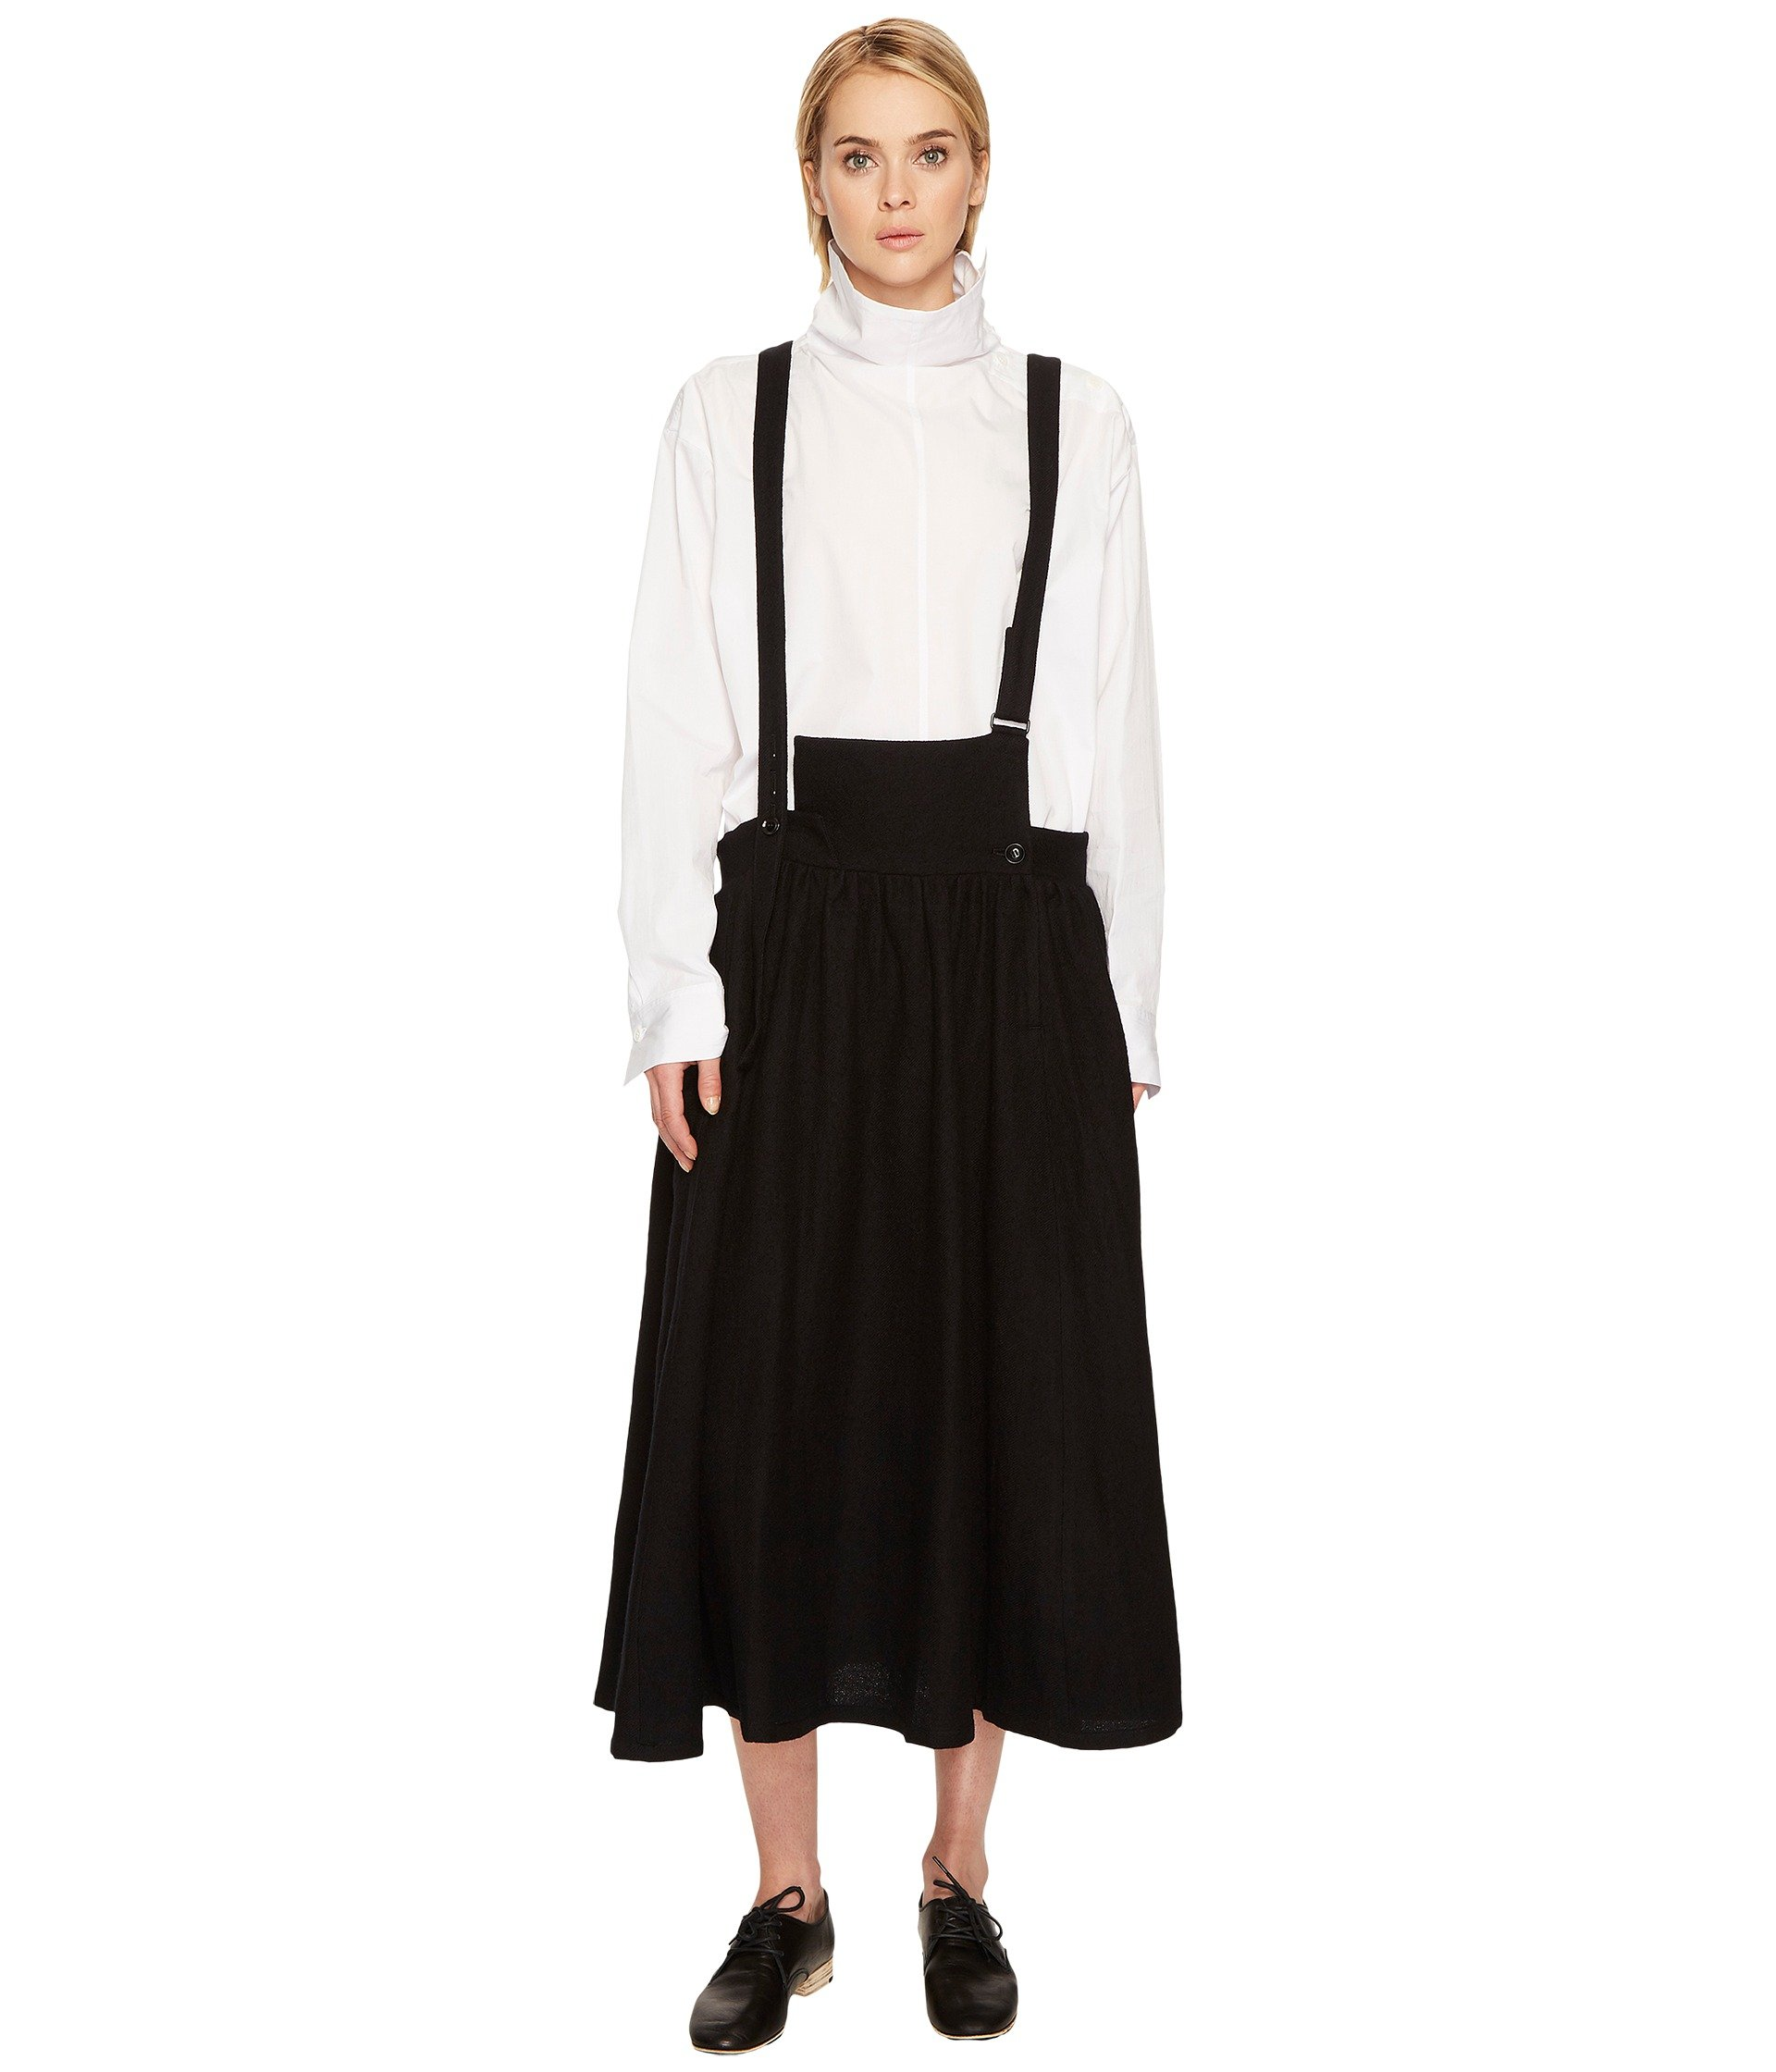 Falda para Mujer Yand#39;s by Yohji Yamamoto S-Fr Gathered Skirt Overalls  +